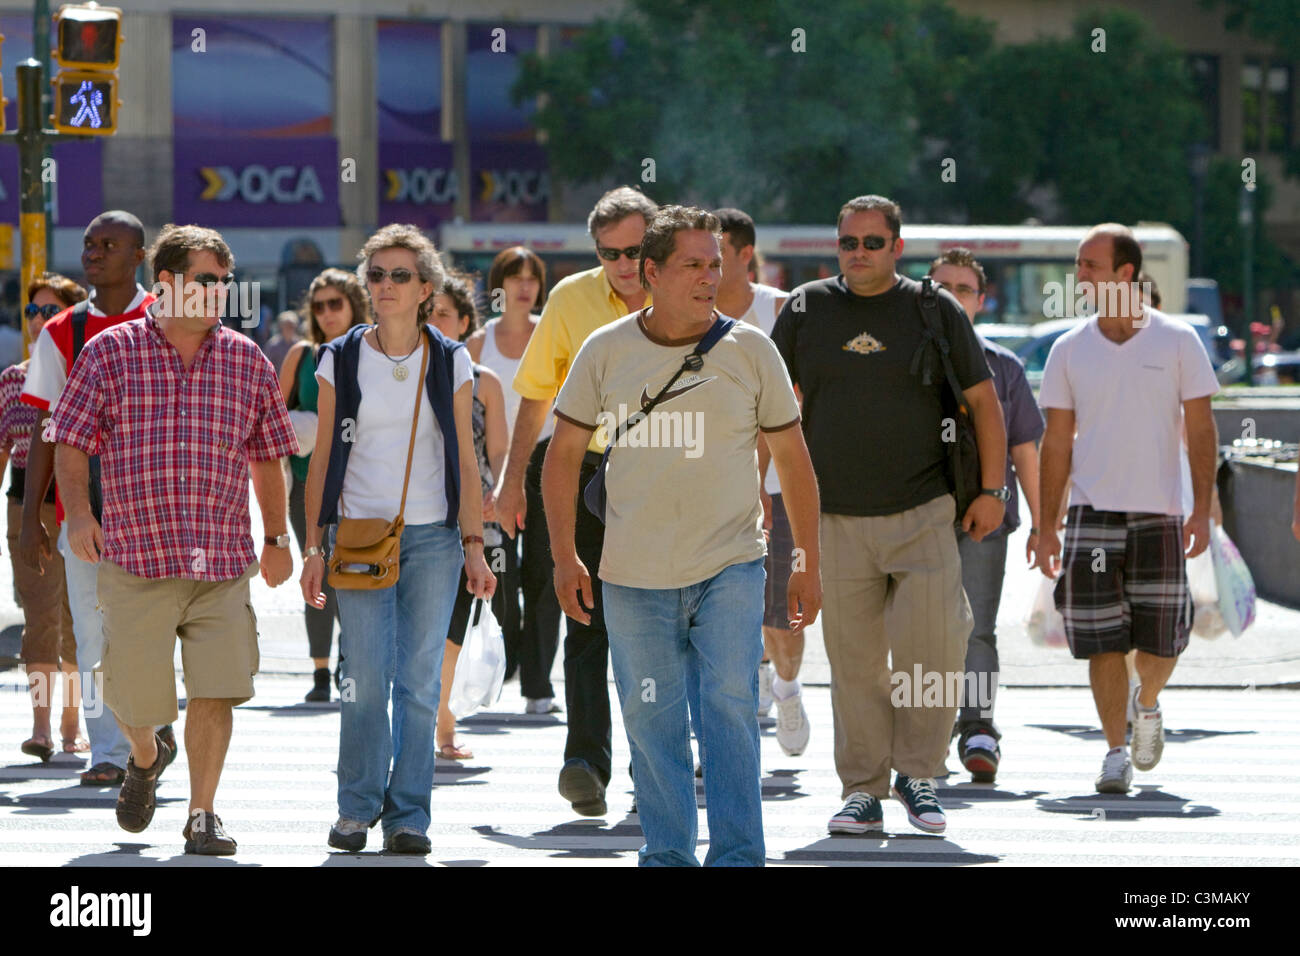 Pedestrians on Avenida 9 de Julio in Buenos Aires, Argentina. - Stock Image